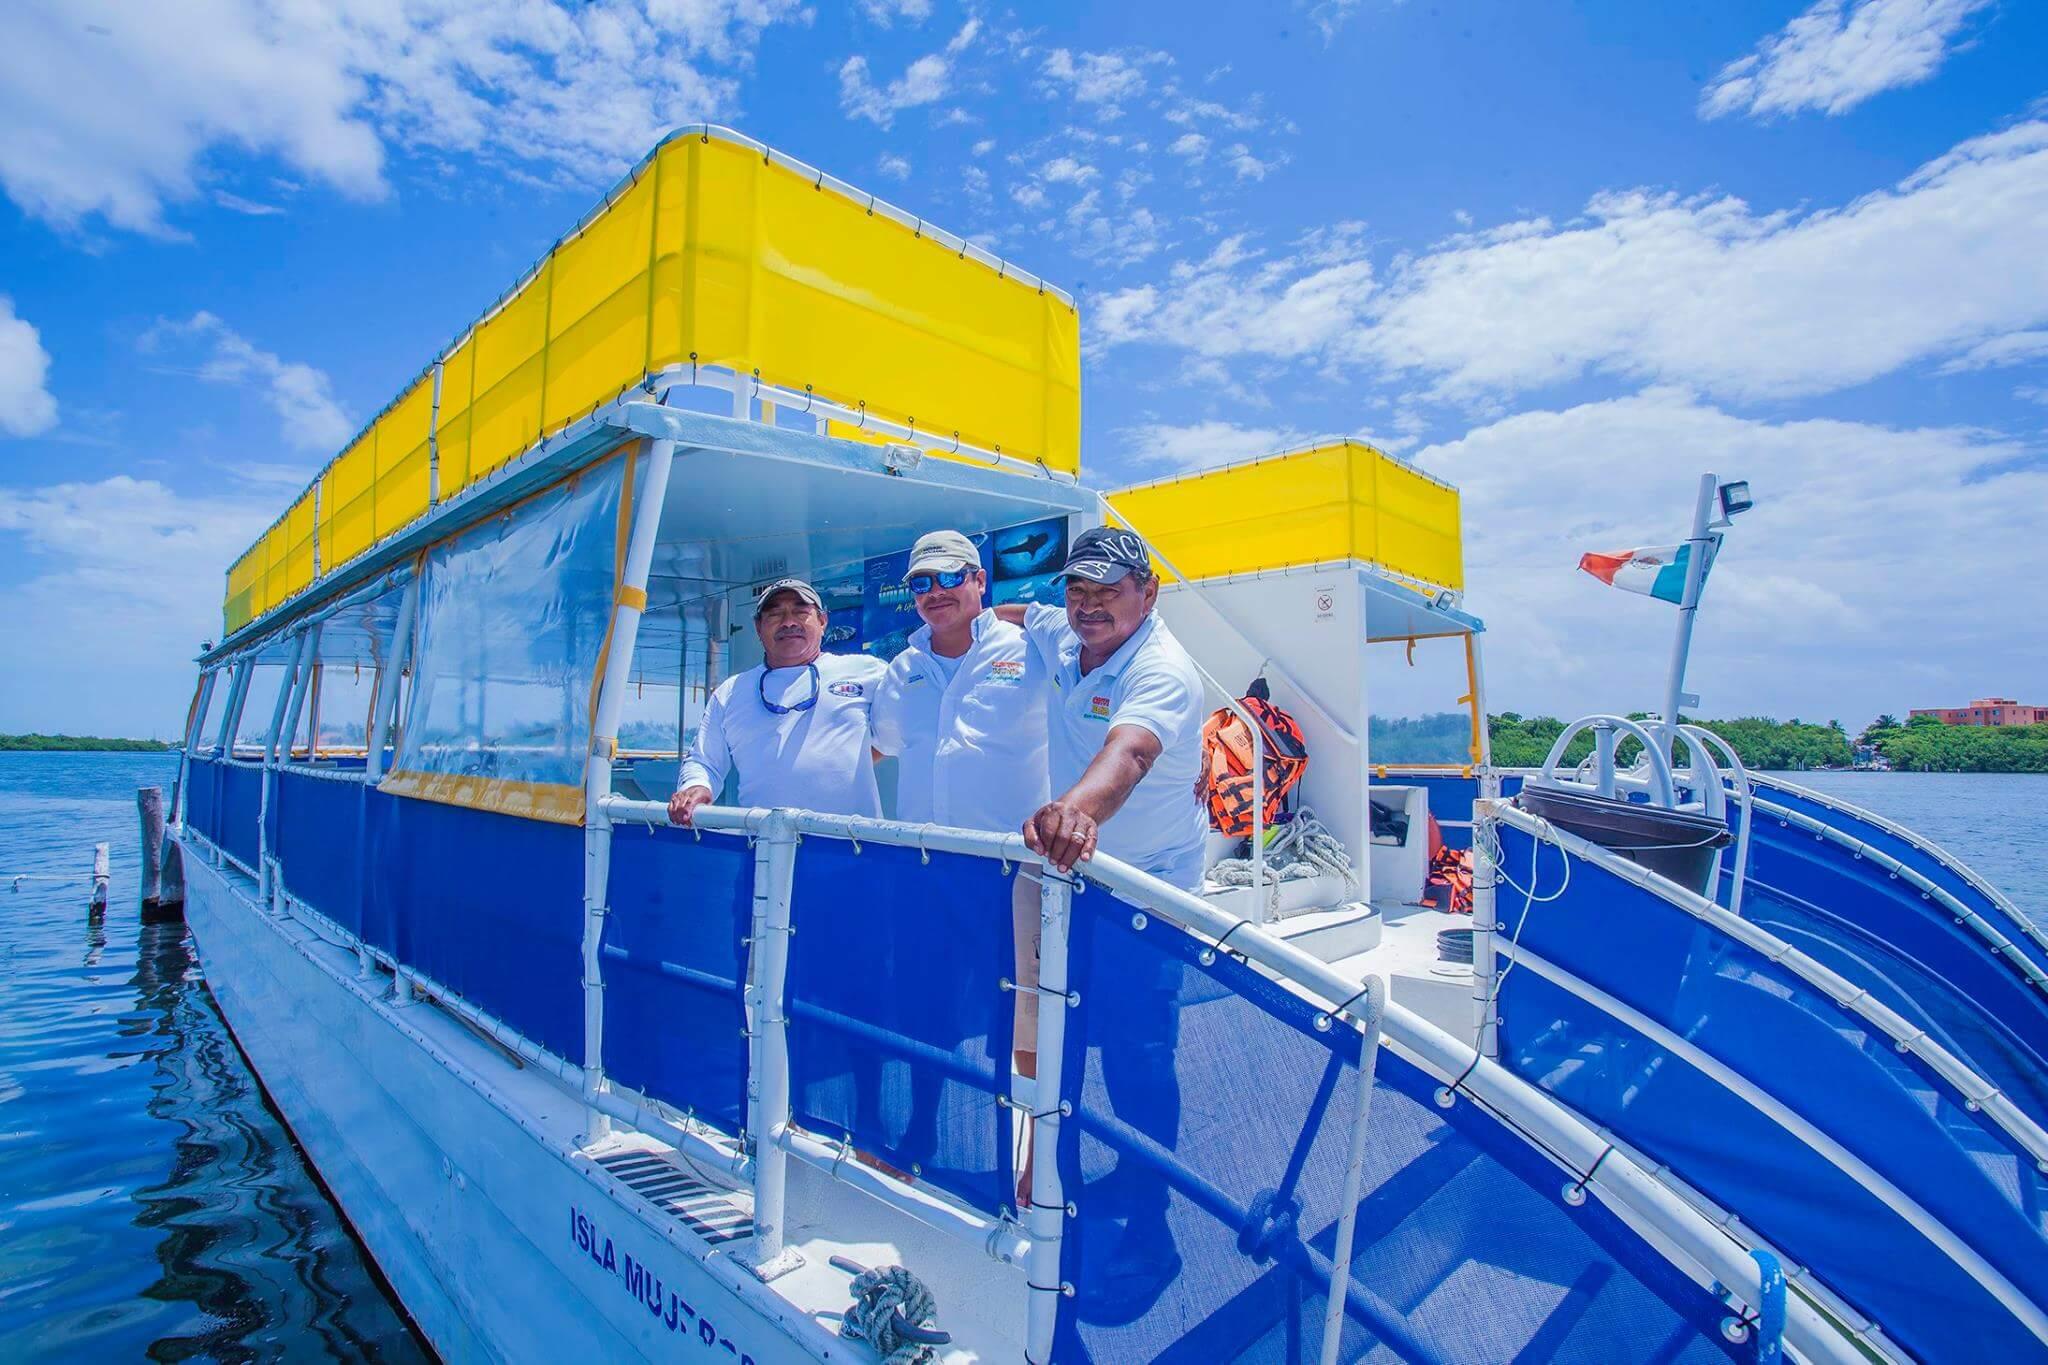 Cancun-Isla-Mujeres-Tours-Snorkel-Beach-All-Inclusive-17